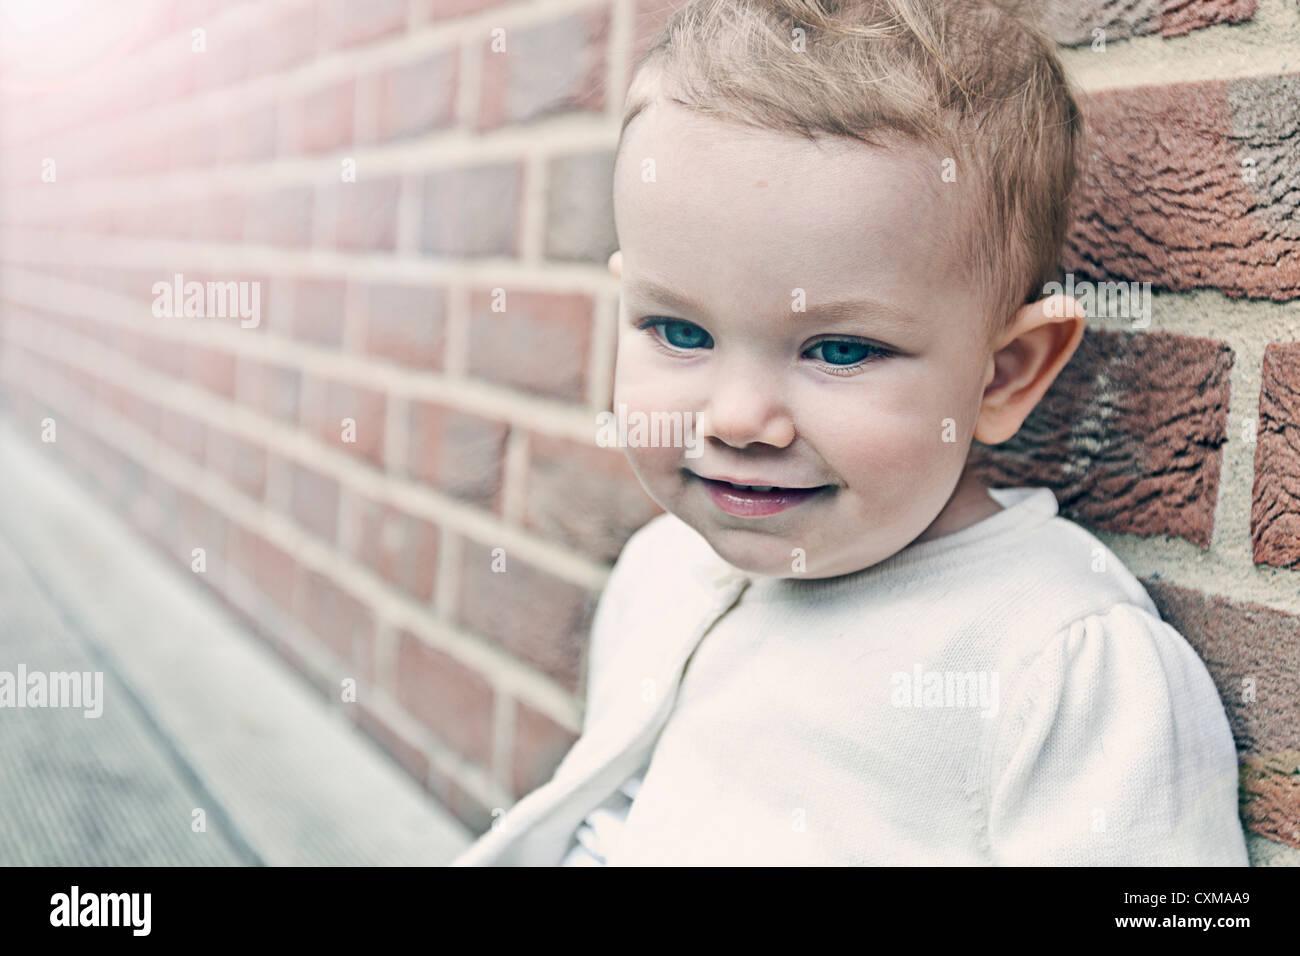 Beautiful Baby Girl against Brick Wall - Stock Image